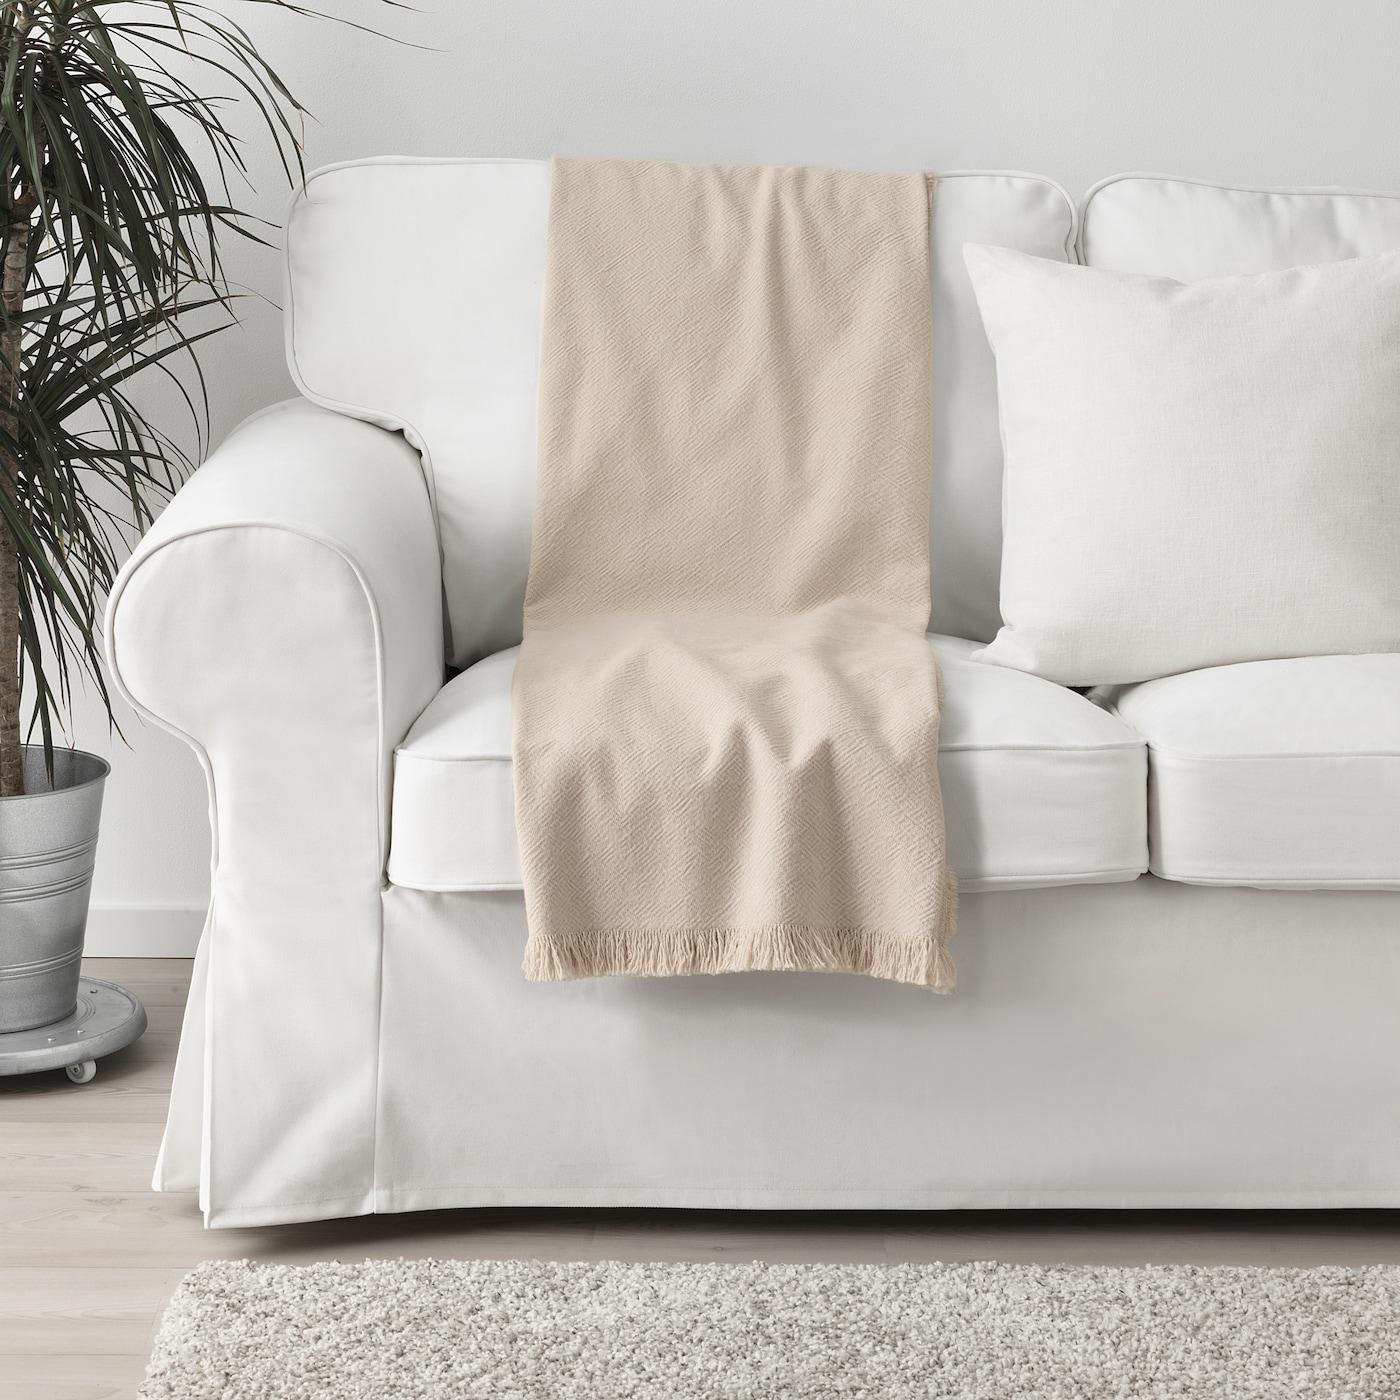 Jofrid Throw Natural 150x200 Cm Ikea